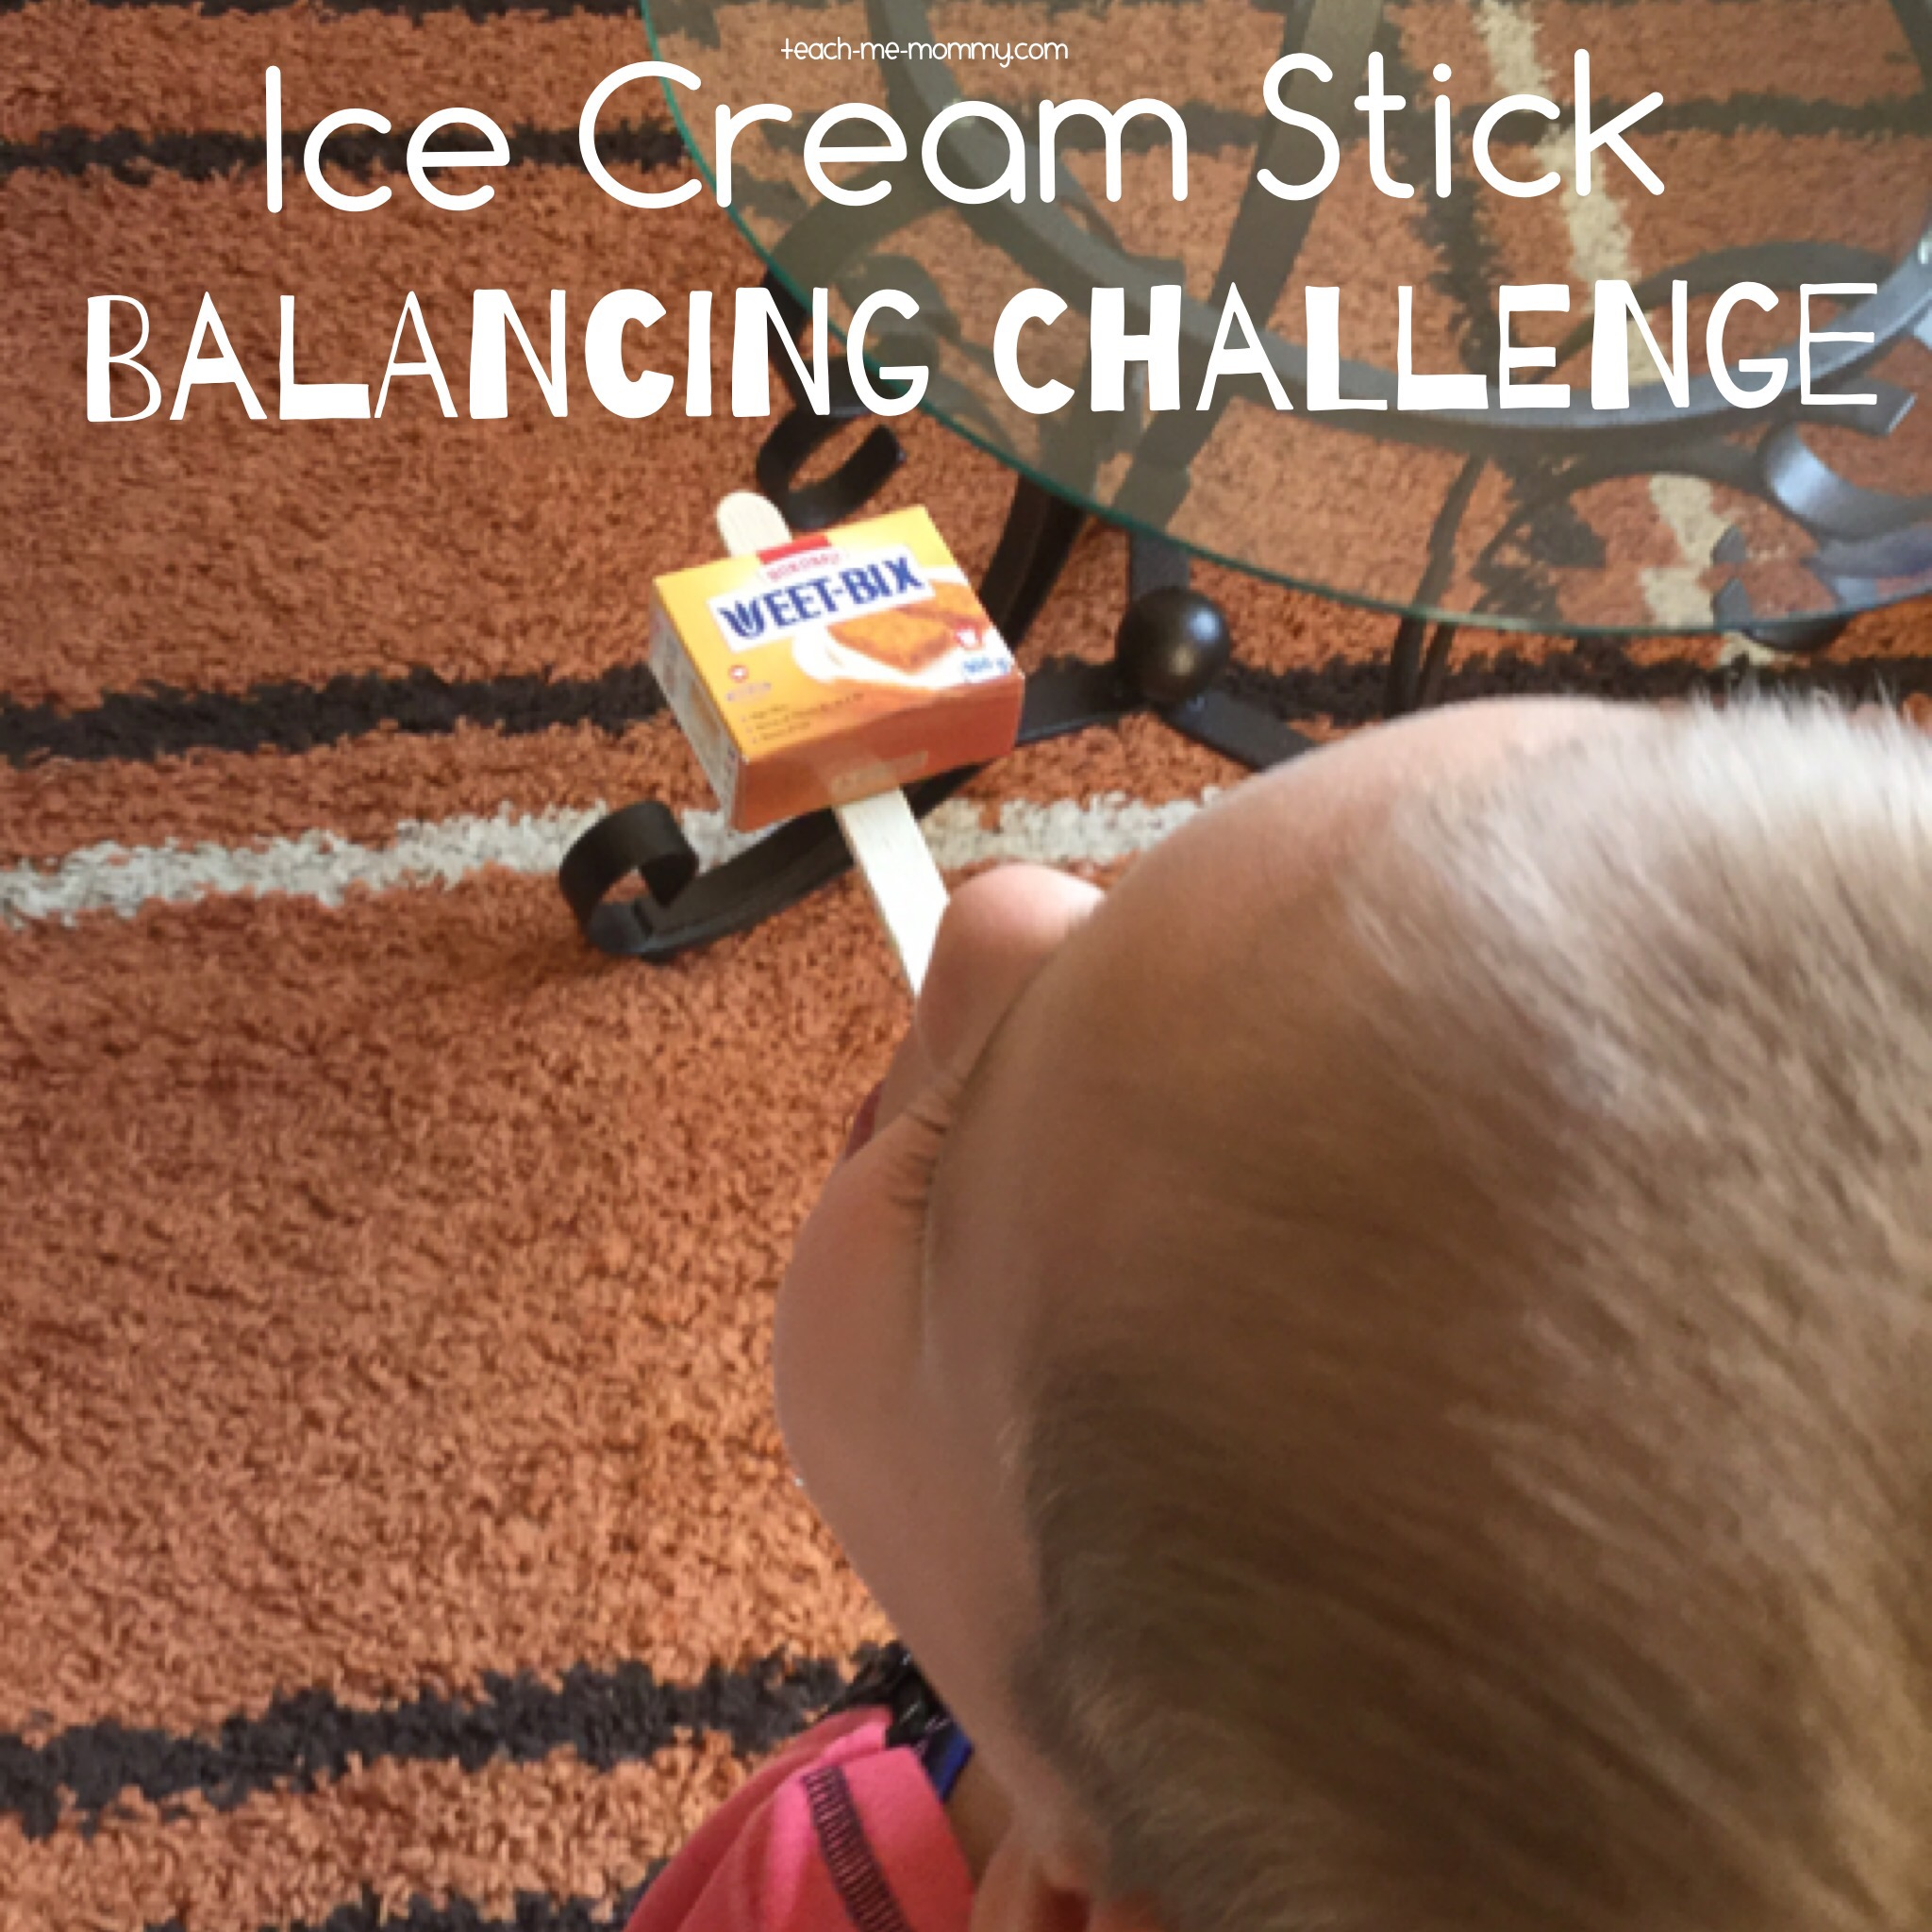 Ice cream stick balancing